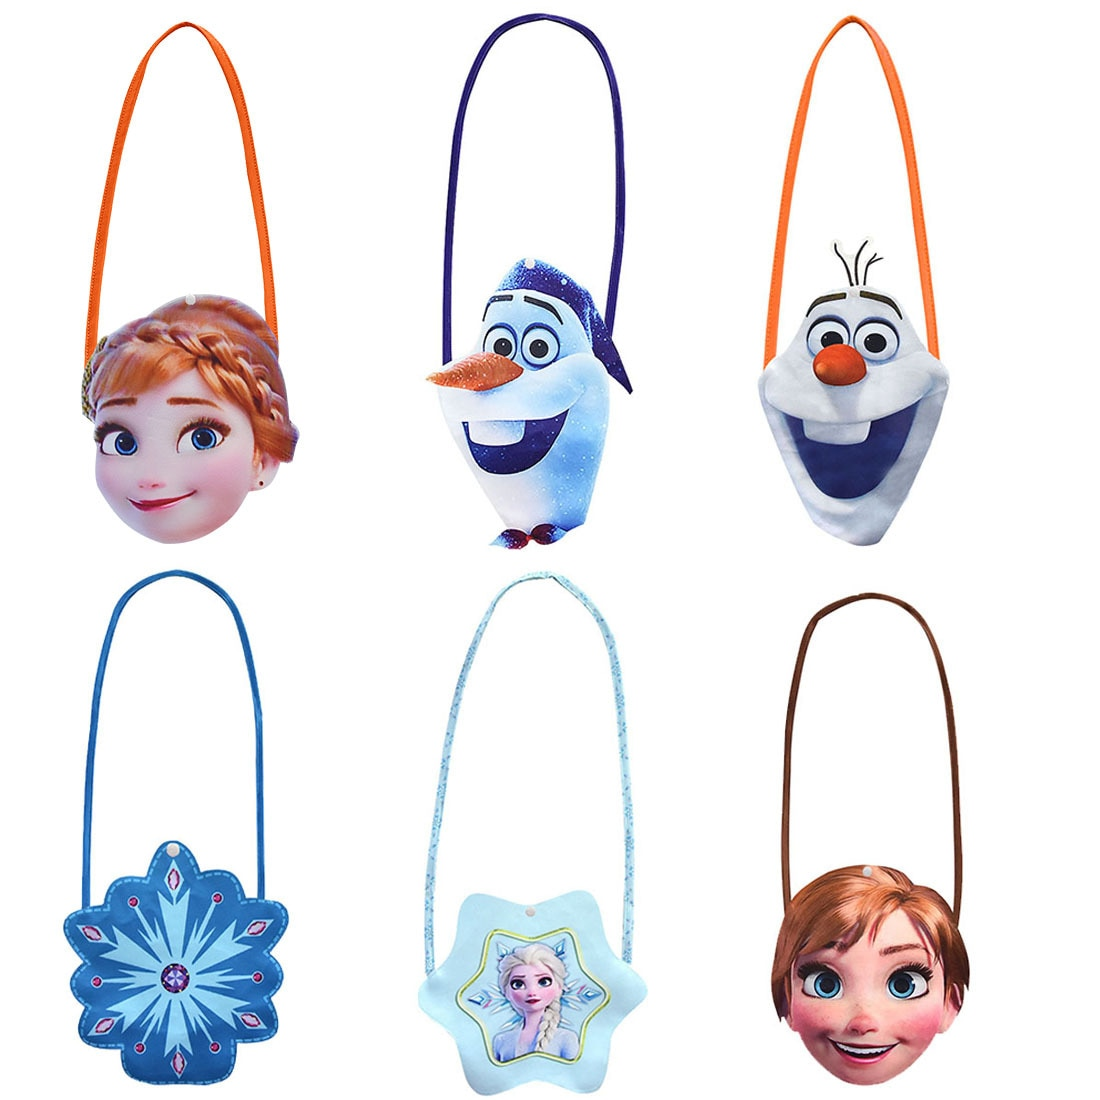 cartoon olaf Disney Frozen2 New Cartoon Bag Anna Elsa Olaf Snowflower Anime Figure Children's Small Shoulder Bag Girl's Favorite Gift Toys